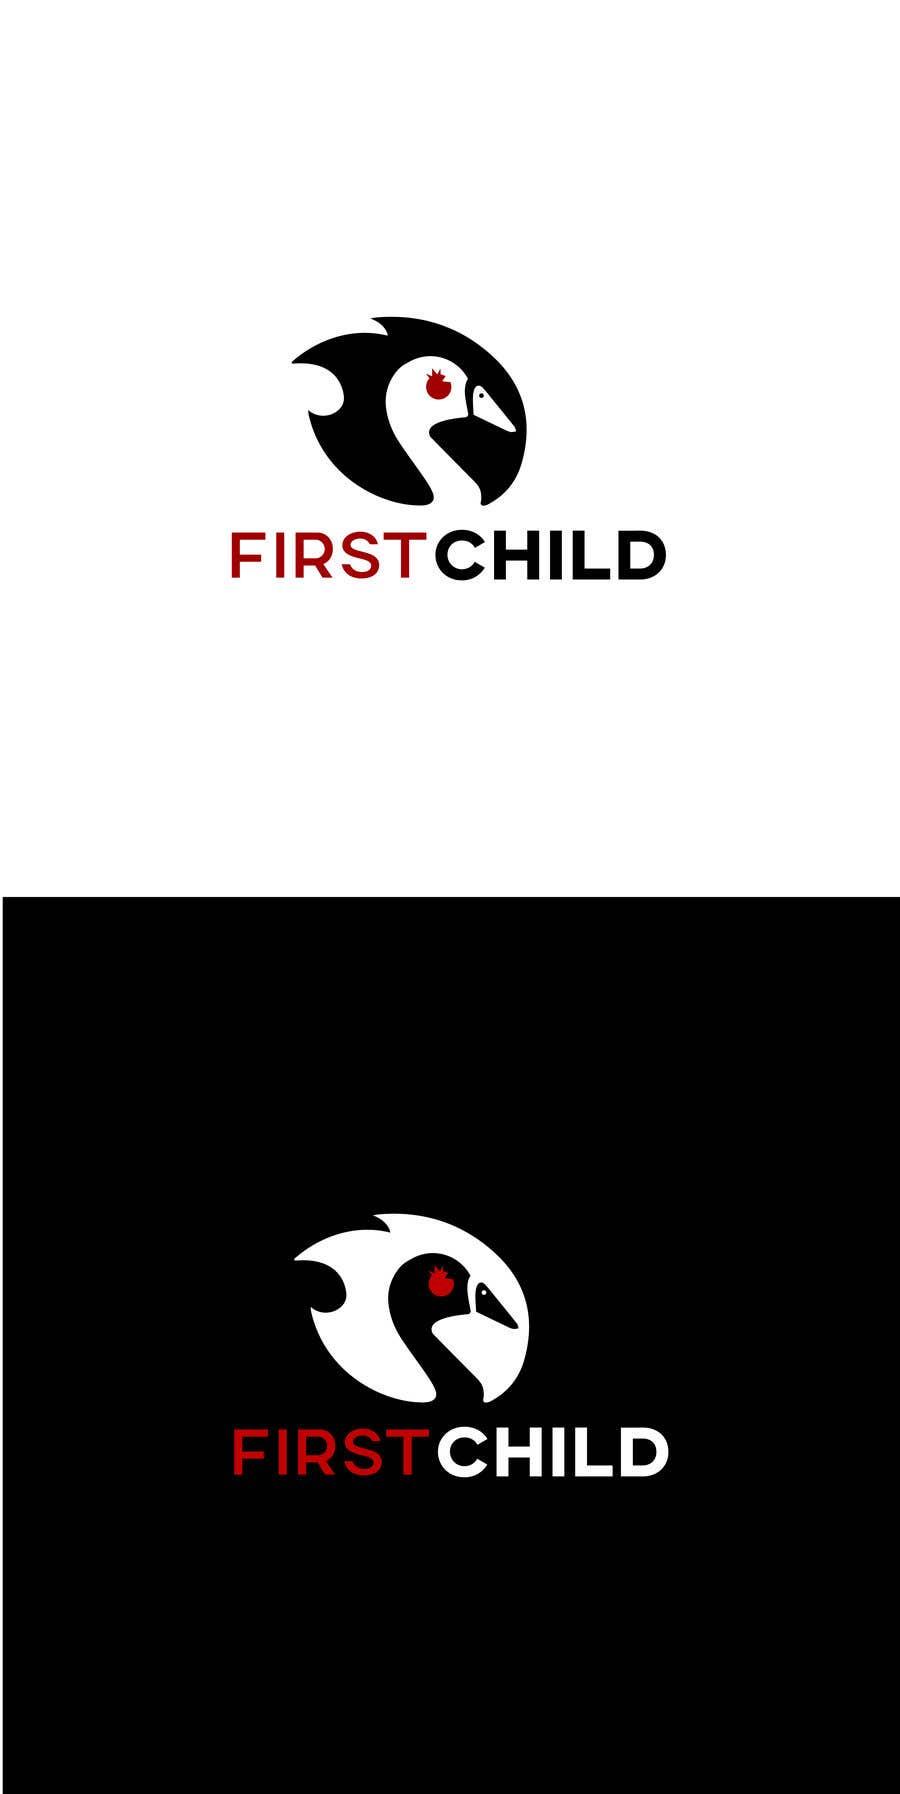 Bài tham dự cuộc thi #                                        18                                      cho                                         Update the logo of my movie production company